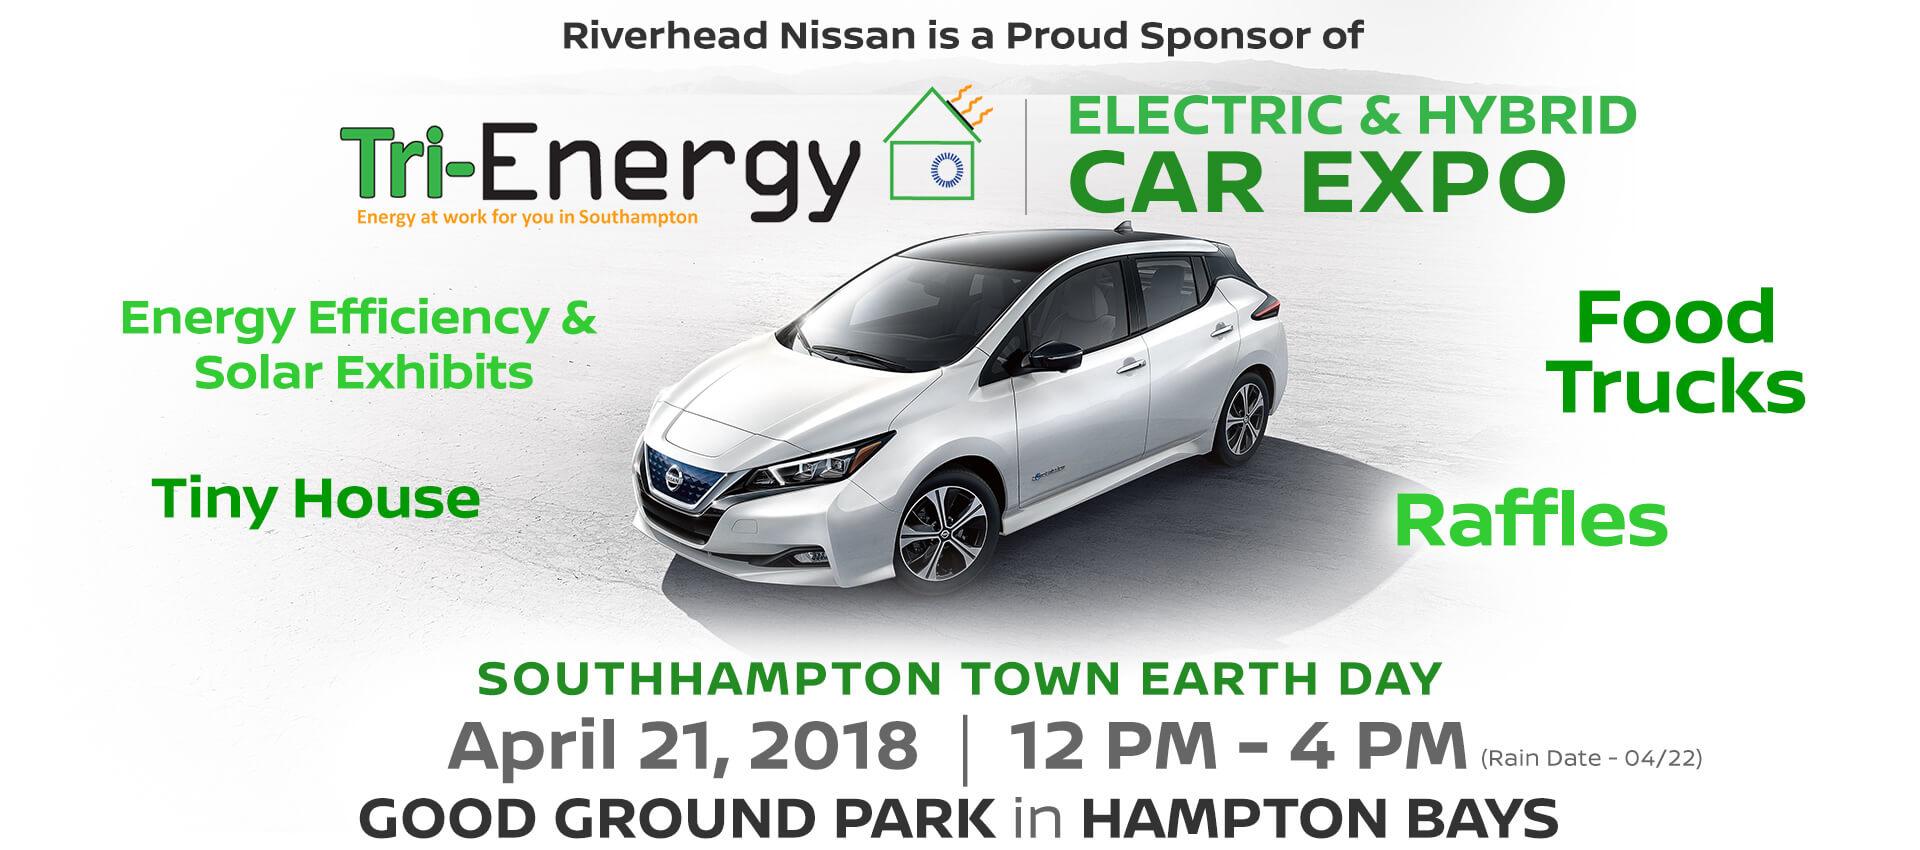 Electric Car Expo